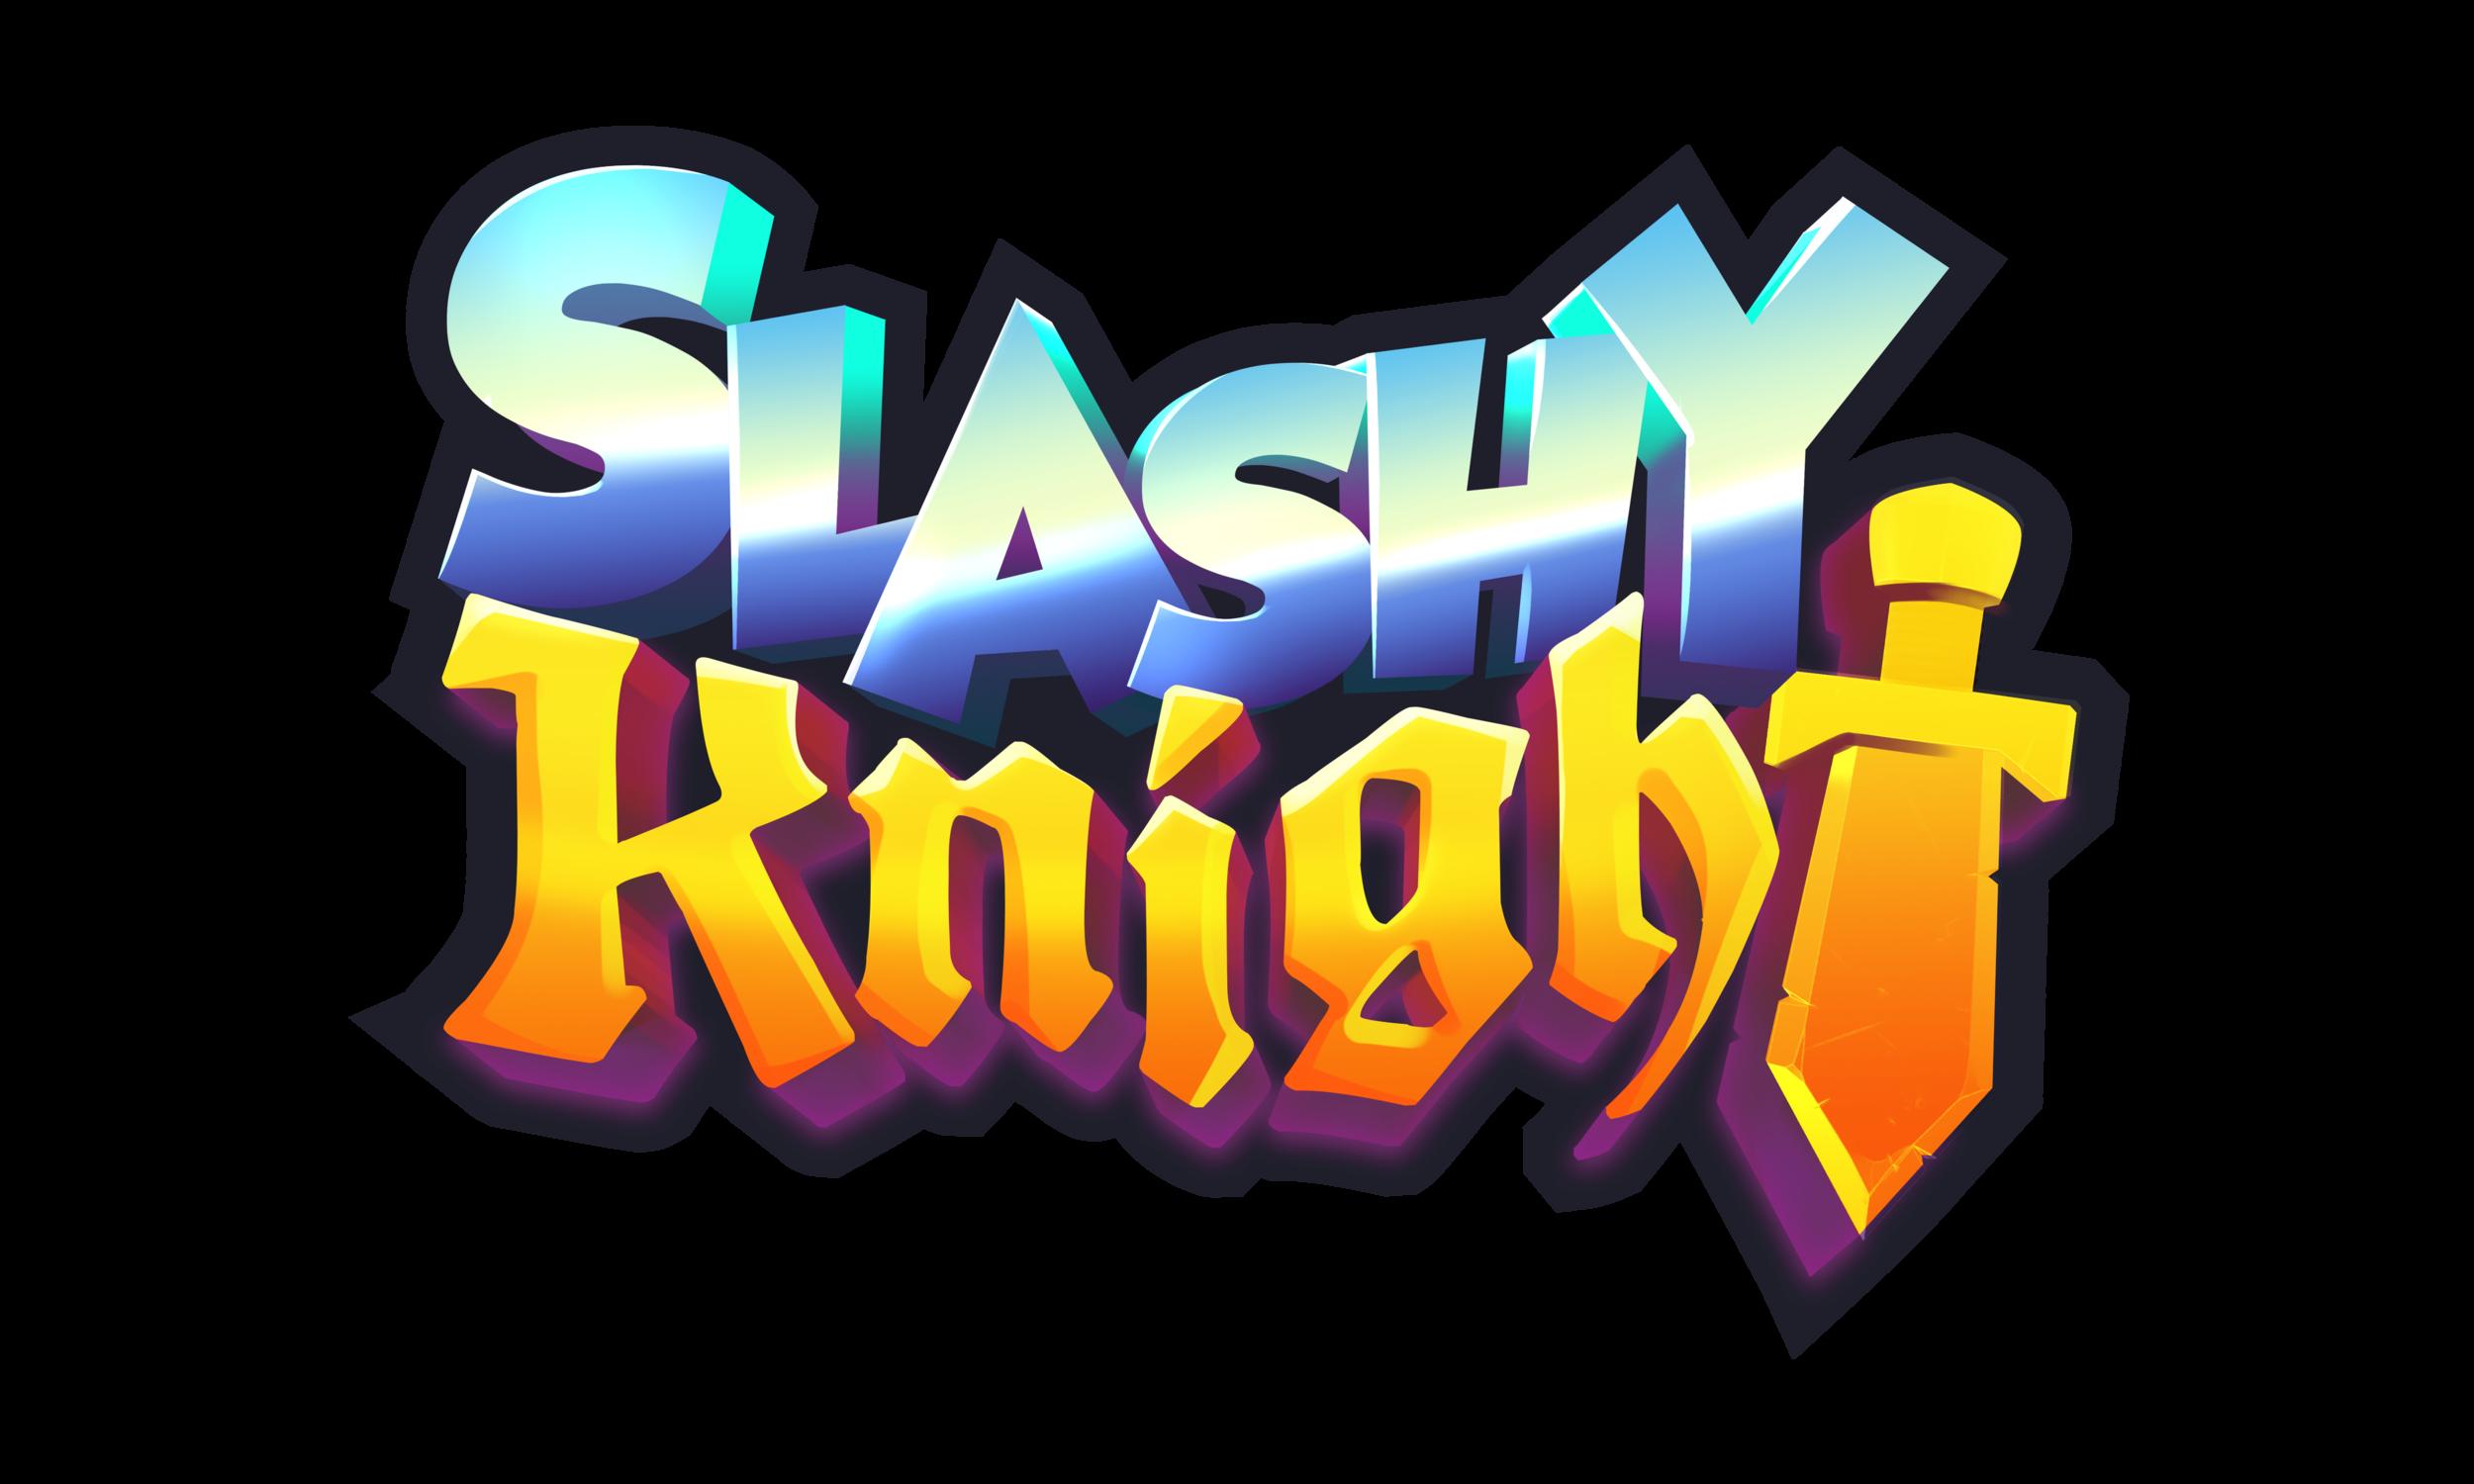 SlashyKnight_logo.png